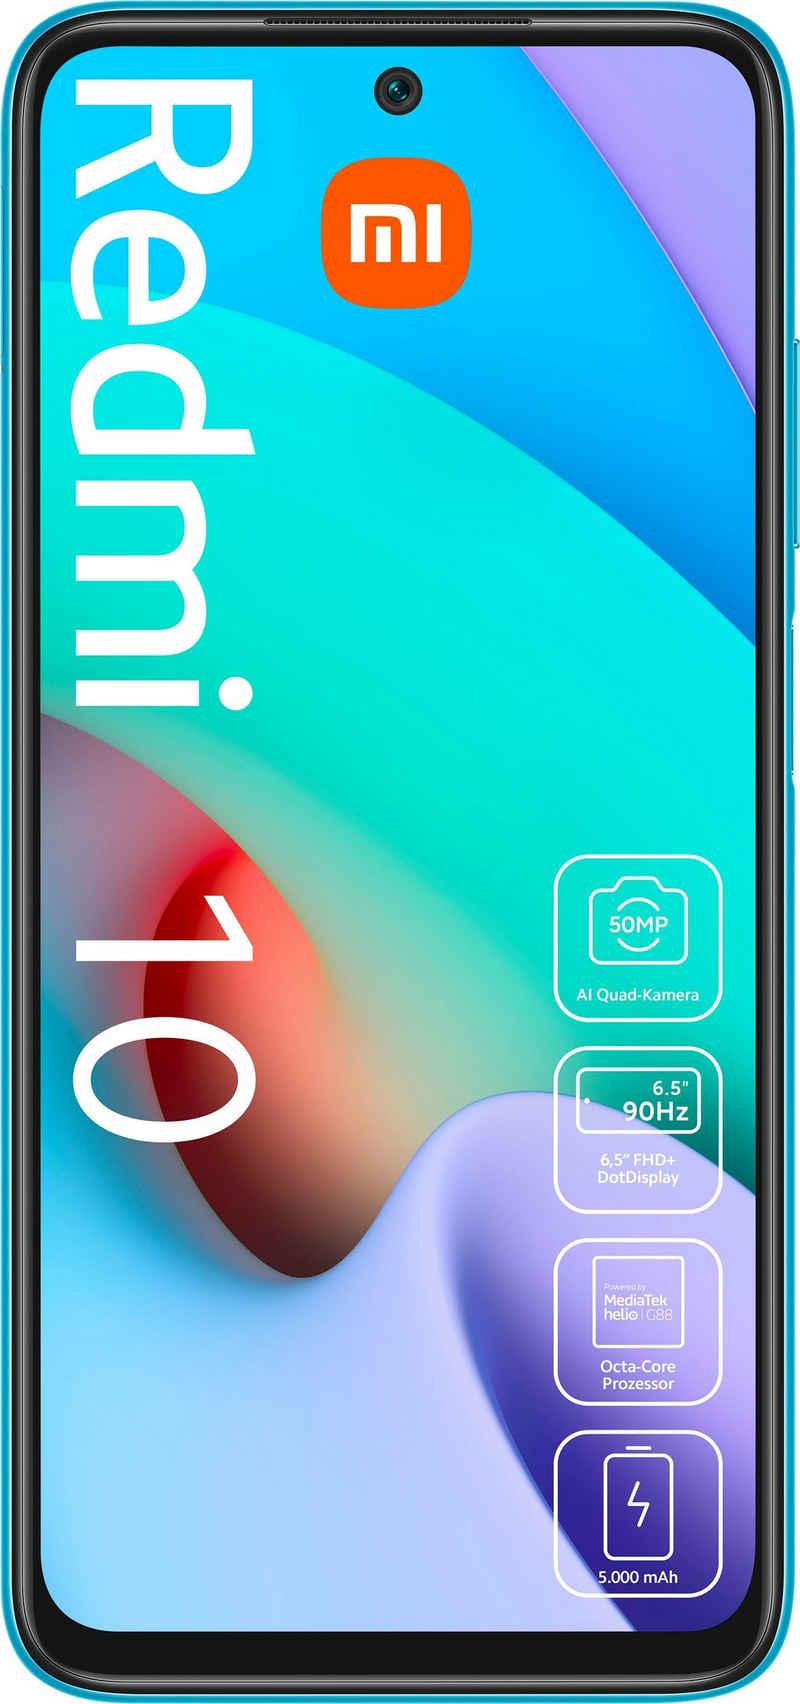 Xiaomi Redmi 10 4GB+128GB Smartphone (16,51 cm/6,5 Zoll, 128 GB Speicherplatz, 50 MP Kamera)